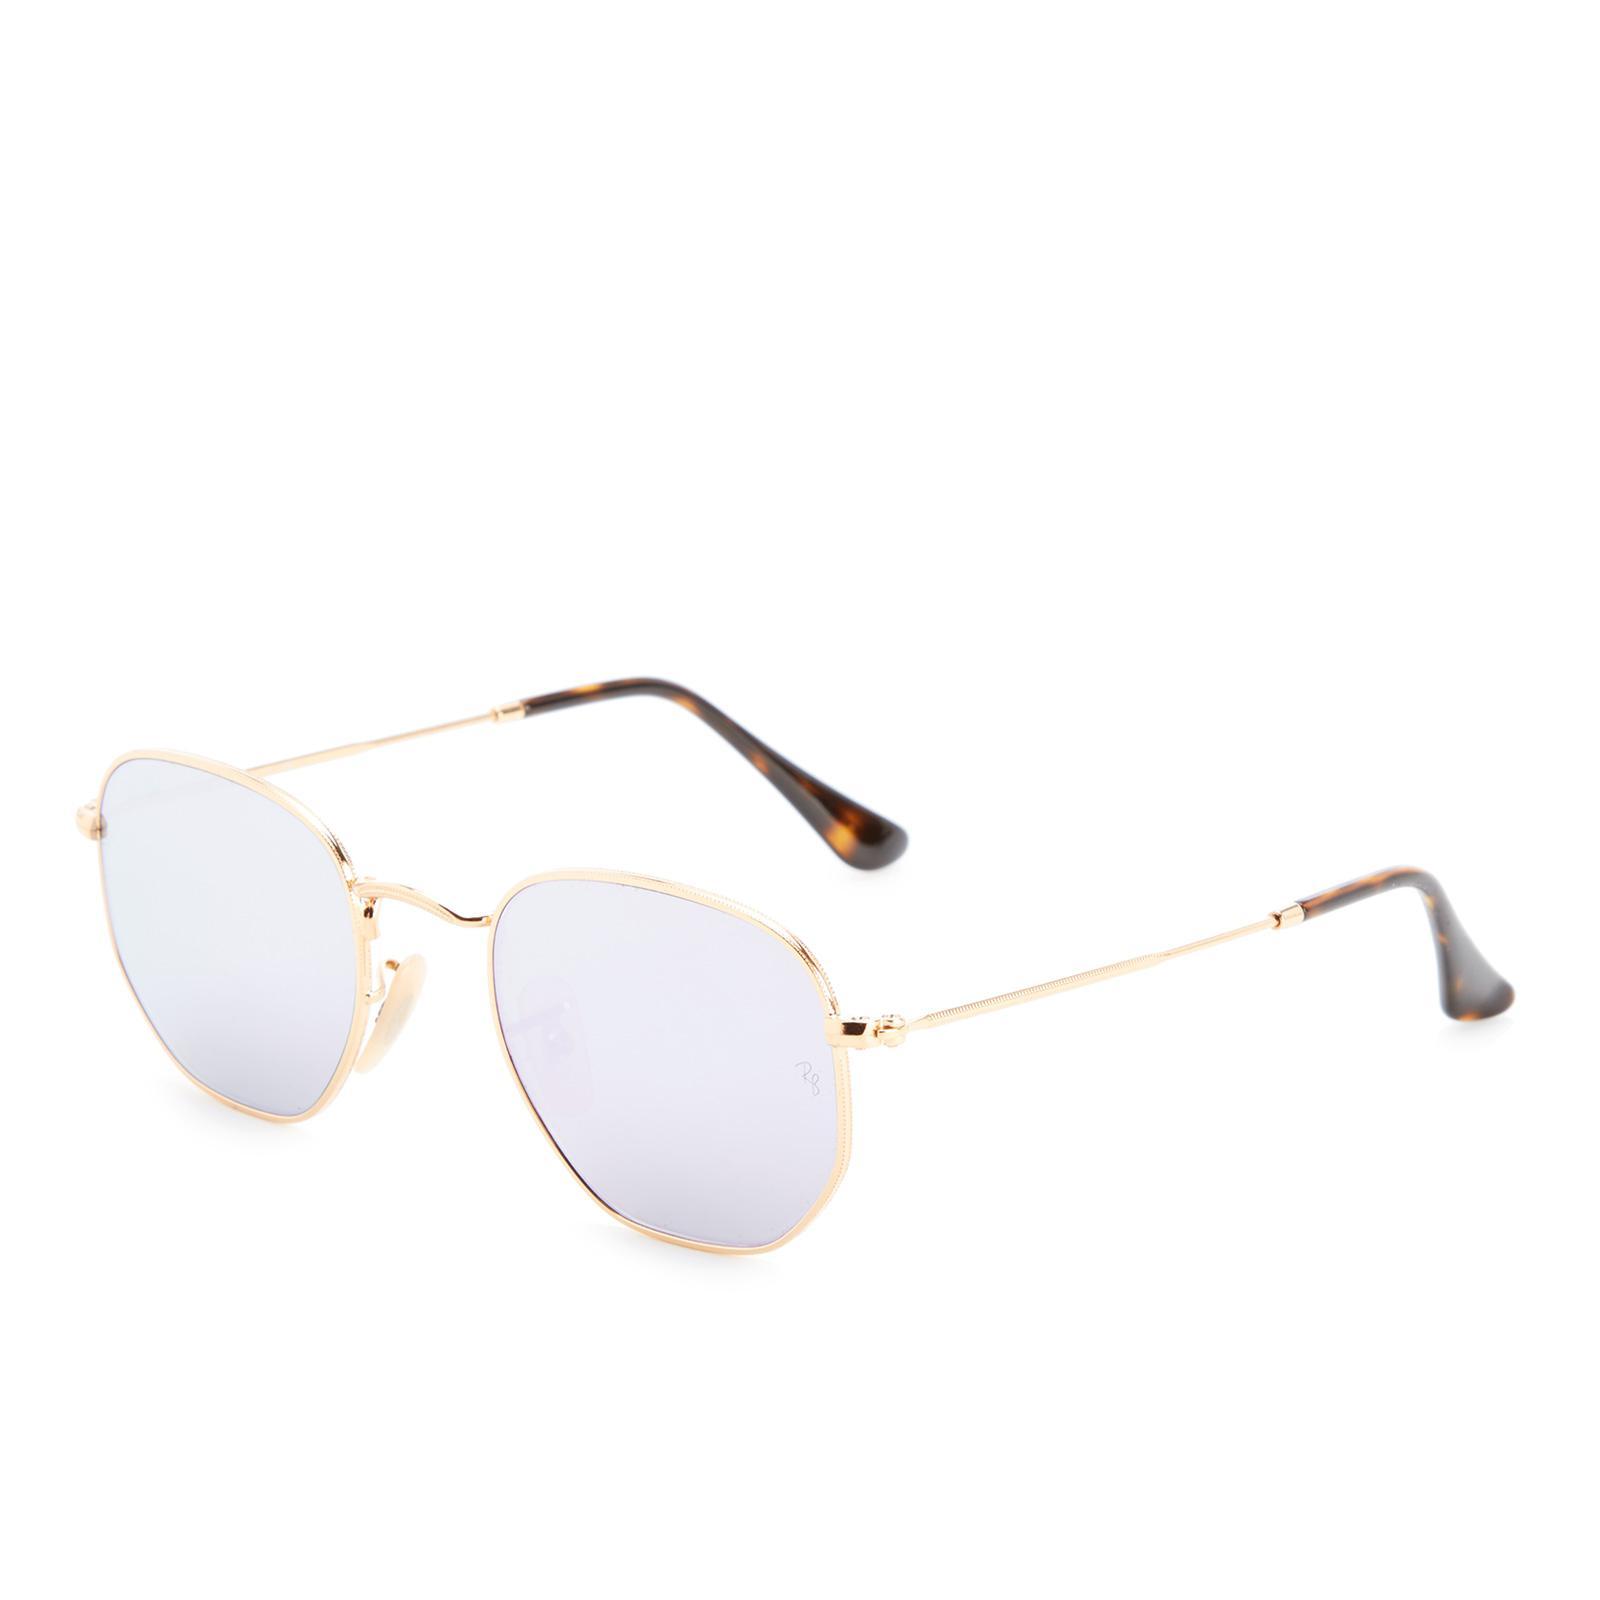 81bf3a3123 Lyst - Ray-Ban Hexagonal Metal Frame Sunglasses